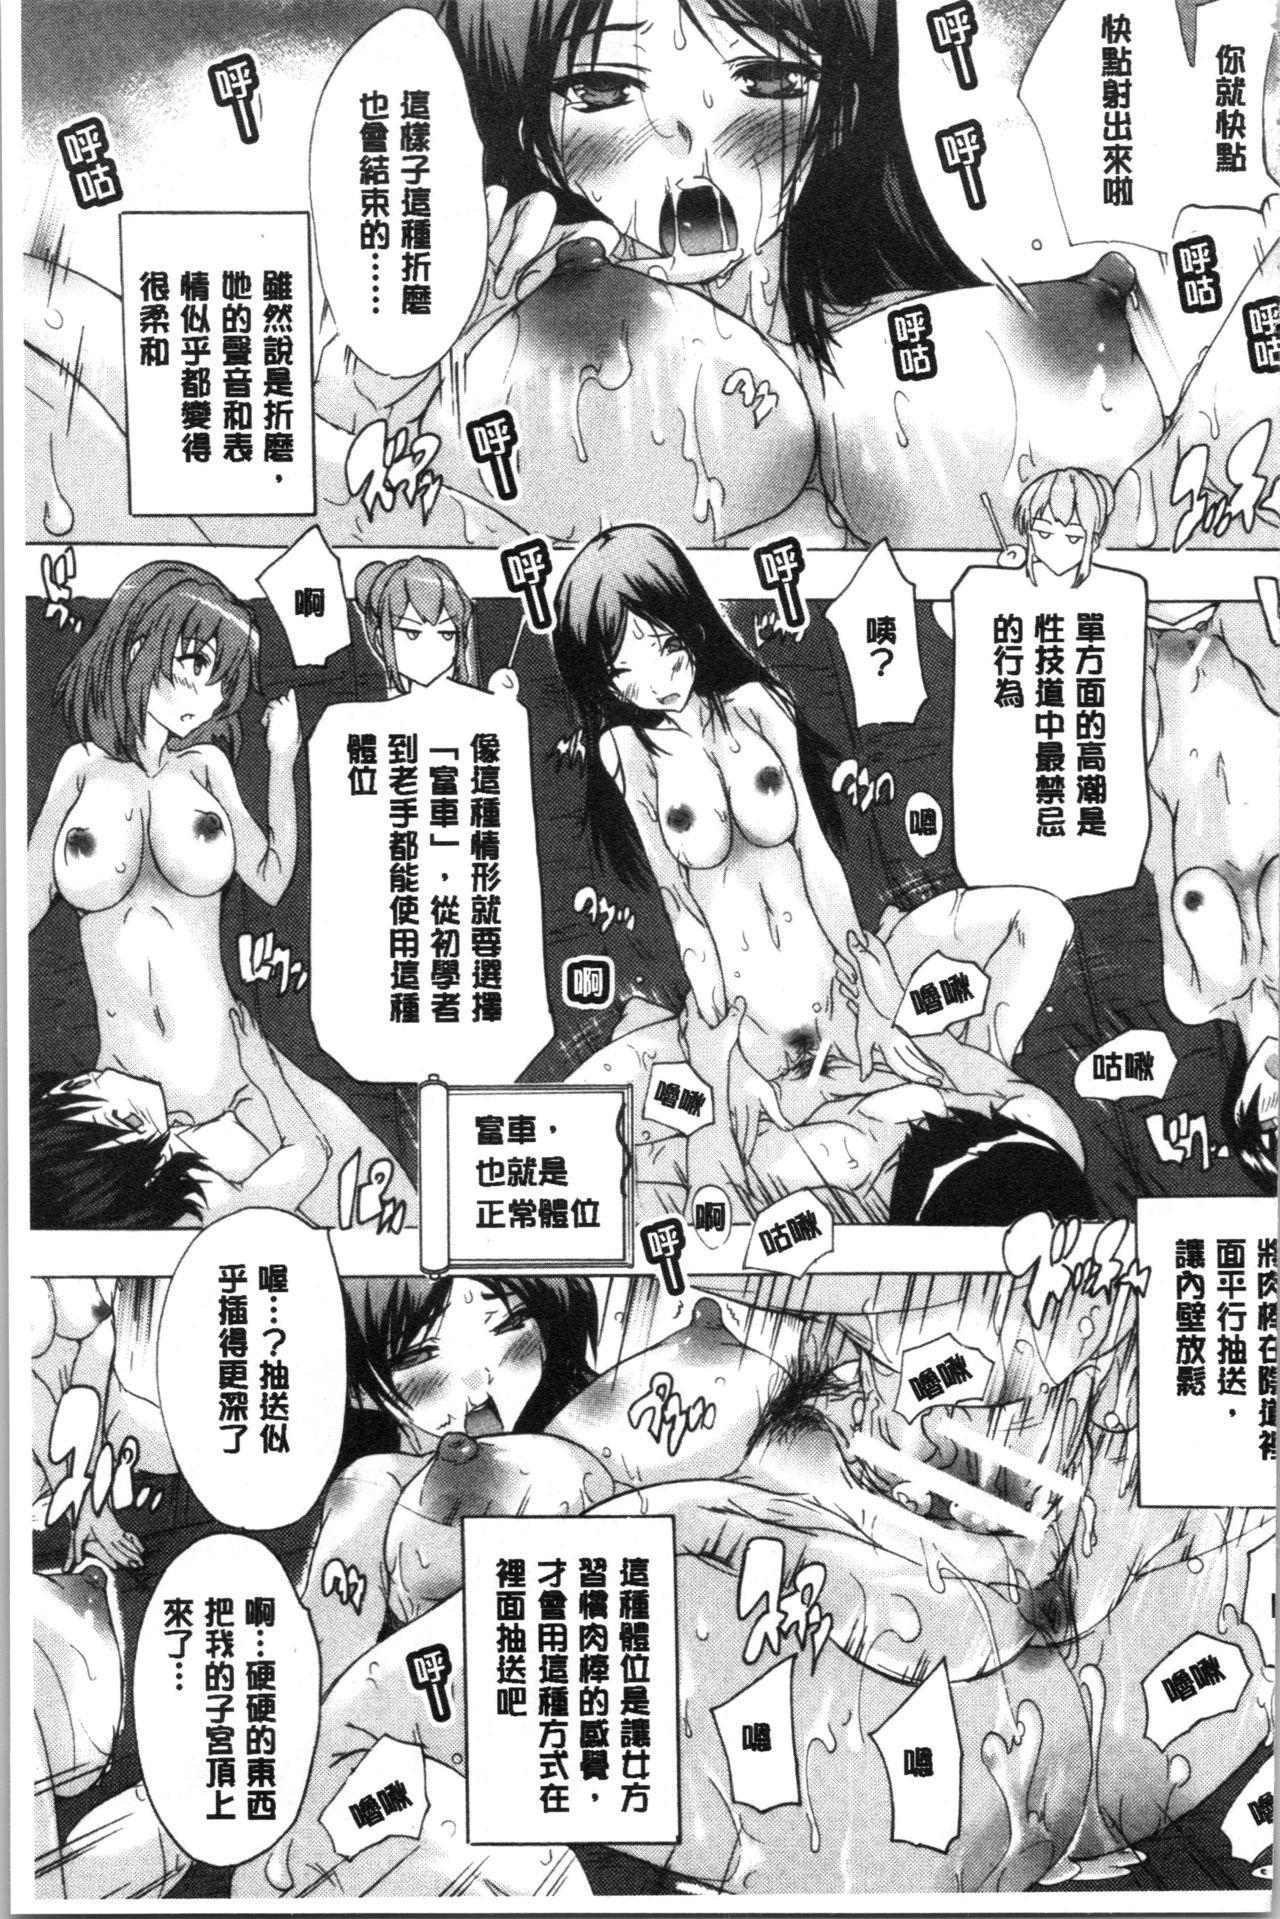 [Natsuka Q-Ya] Hisshuu!! Sex-bu - SEIGI-DO The Ultimate Martial Arts   必修!!性愛淫交部 [Chinese] 53